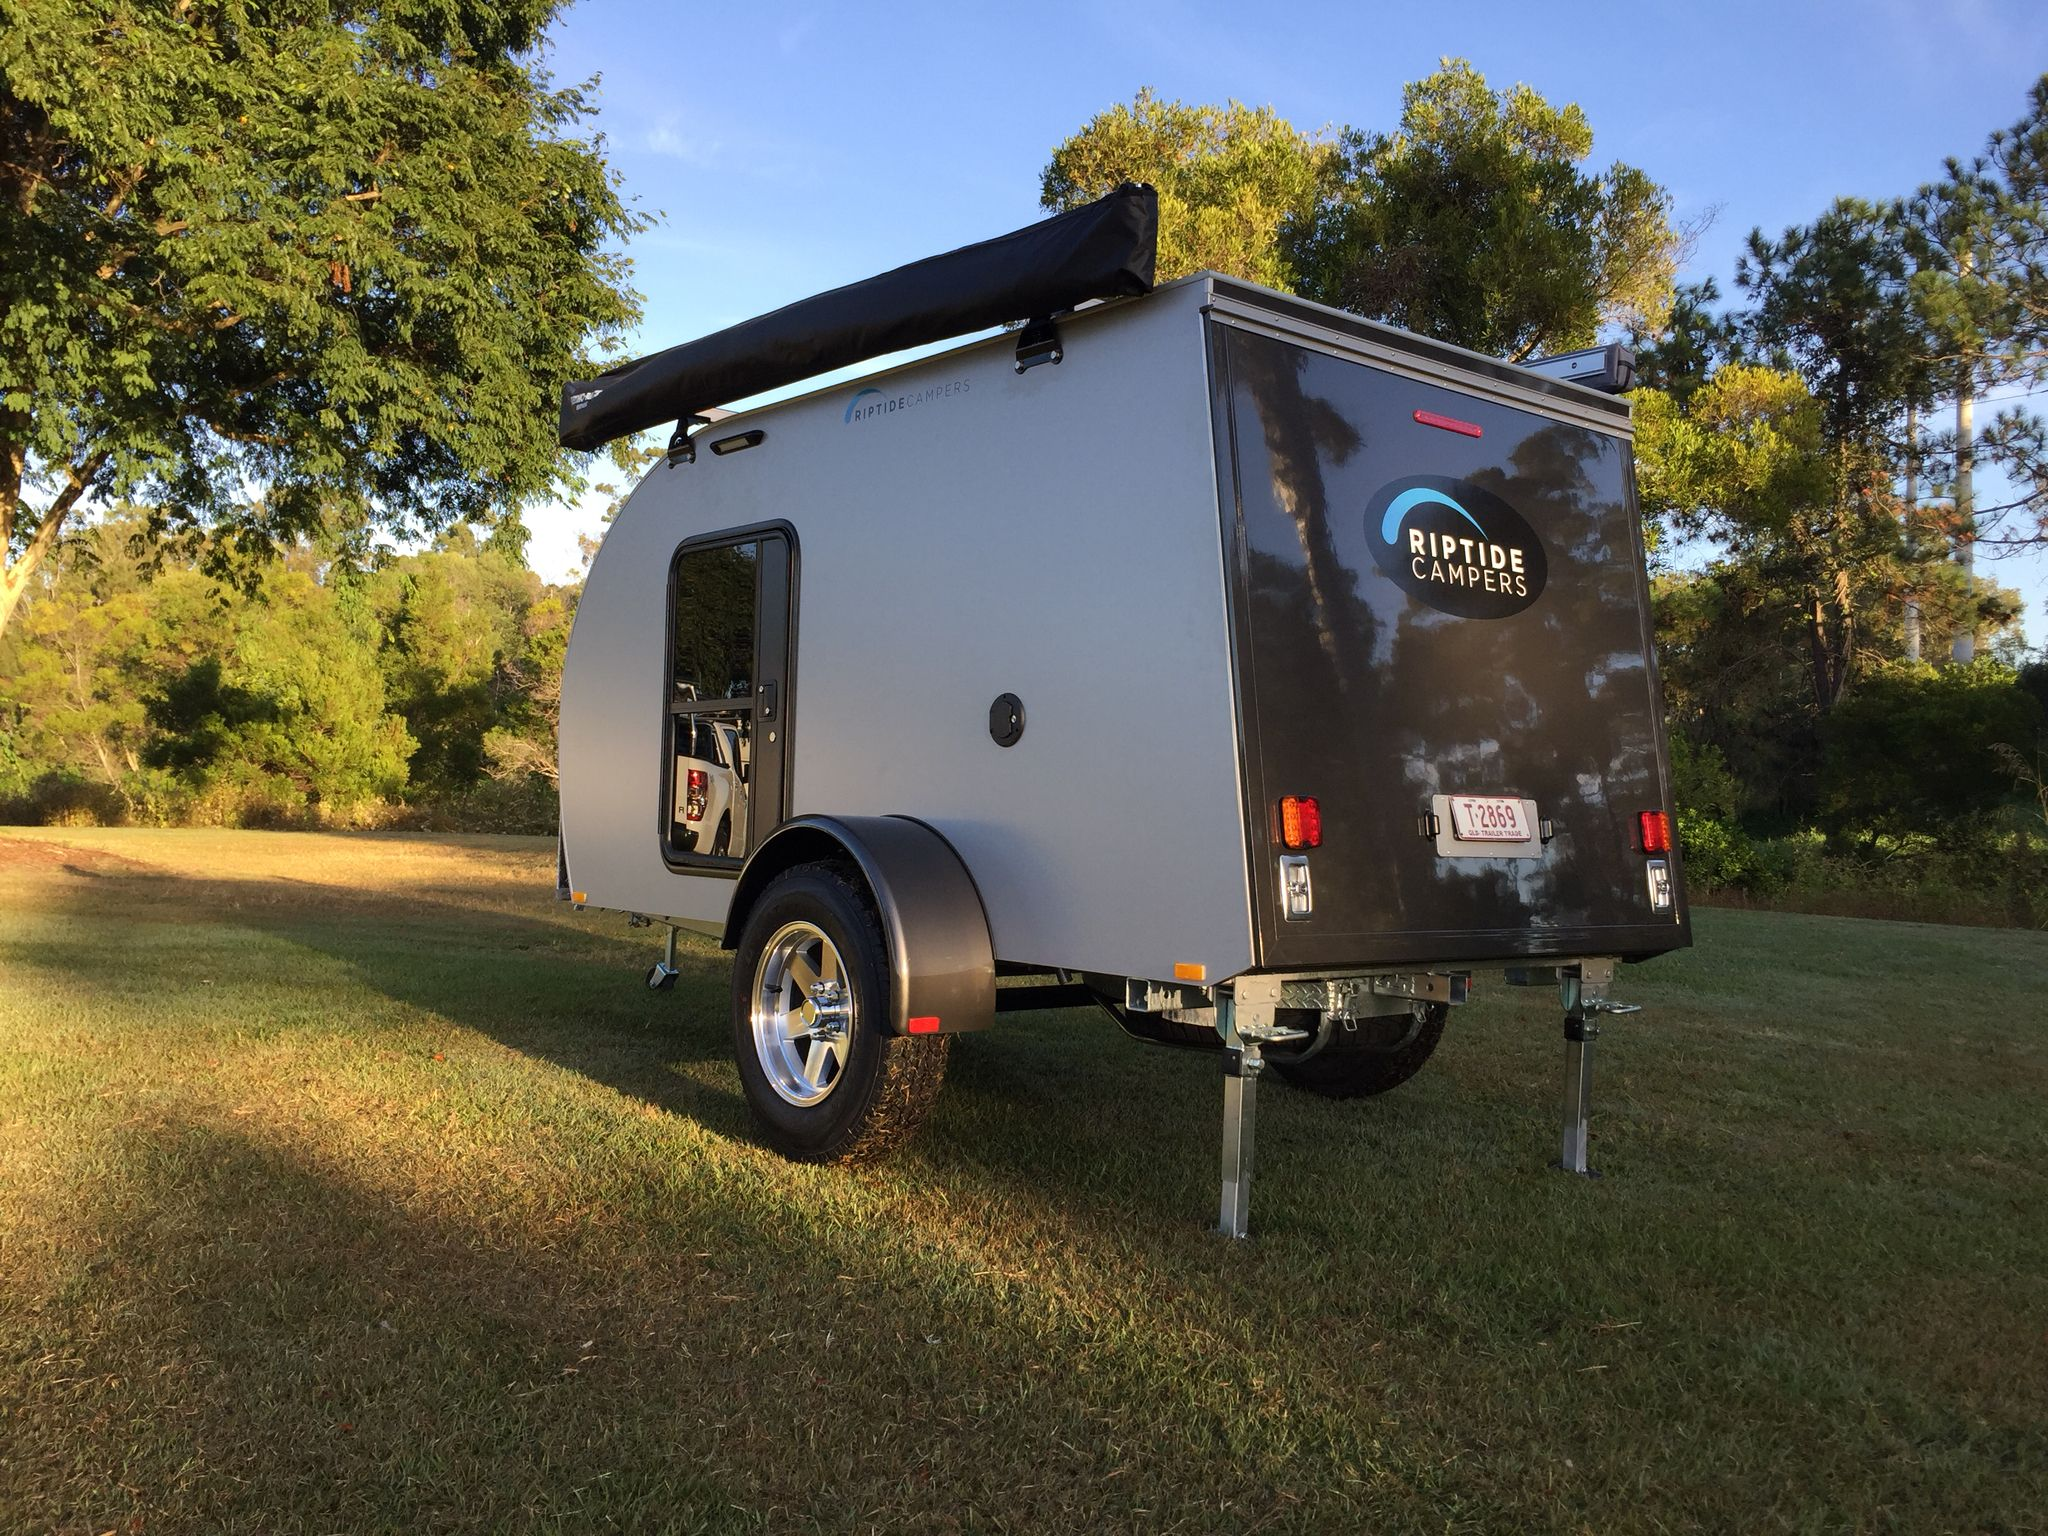 Riptide Campers Summit- Off Road Teardrop camper  | Teardrop trailer